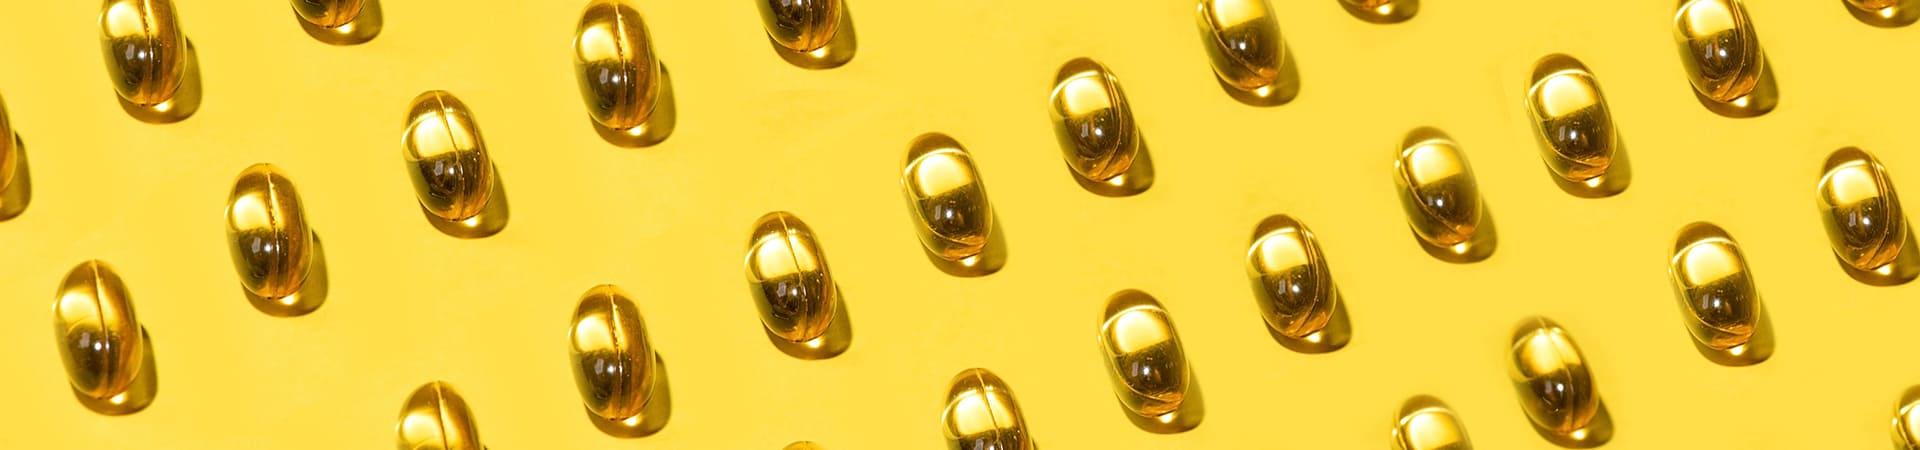 nutraceuticals manufacturing